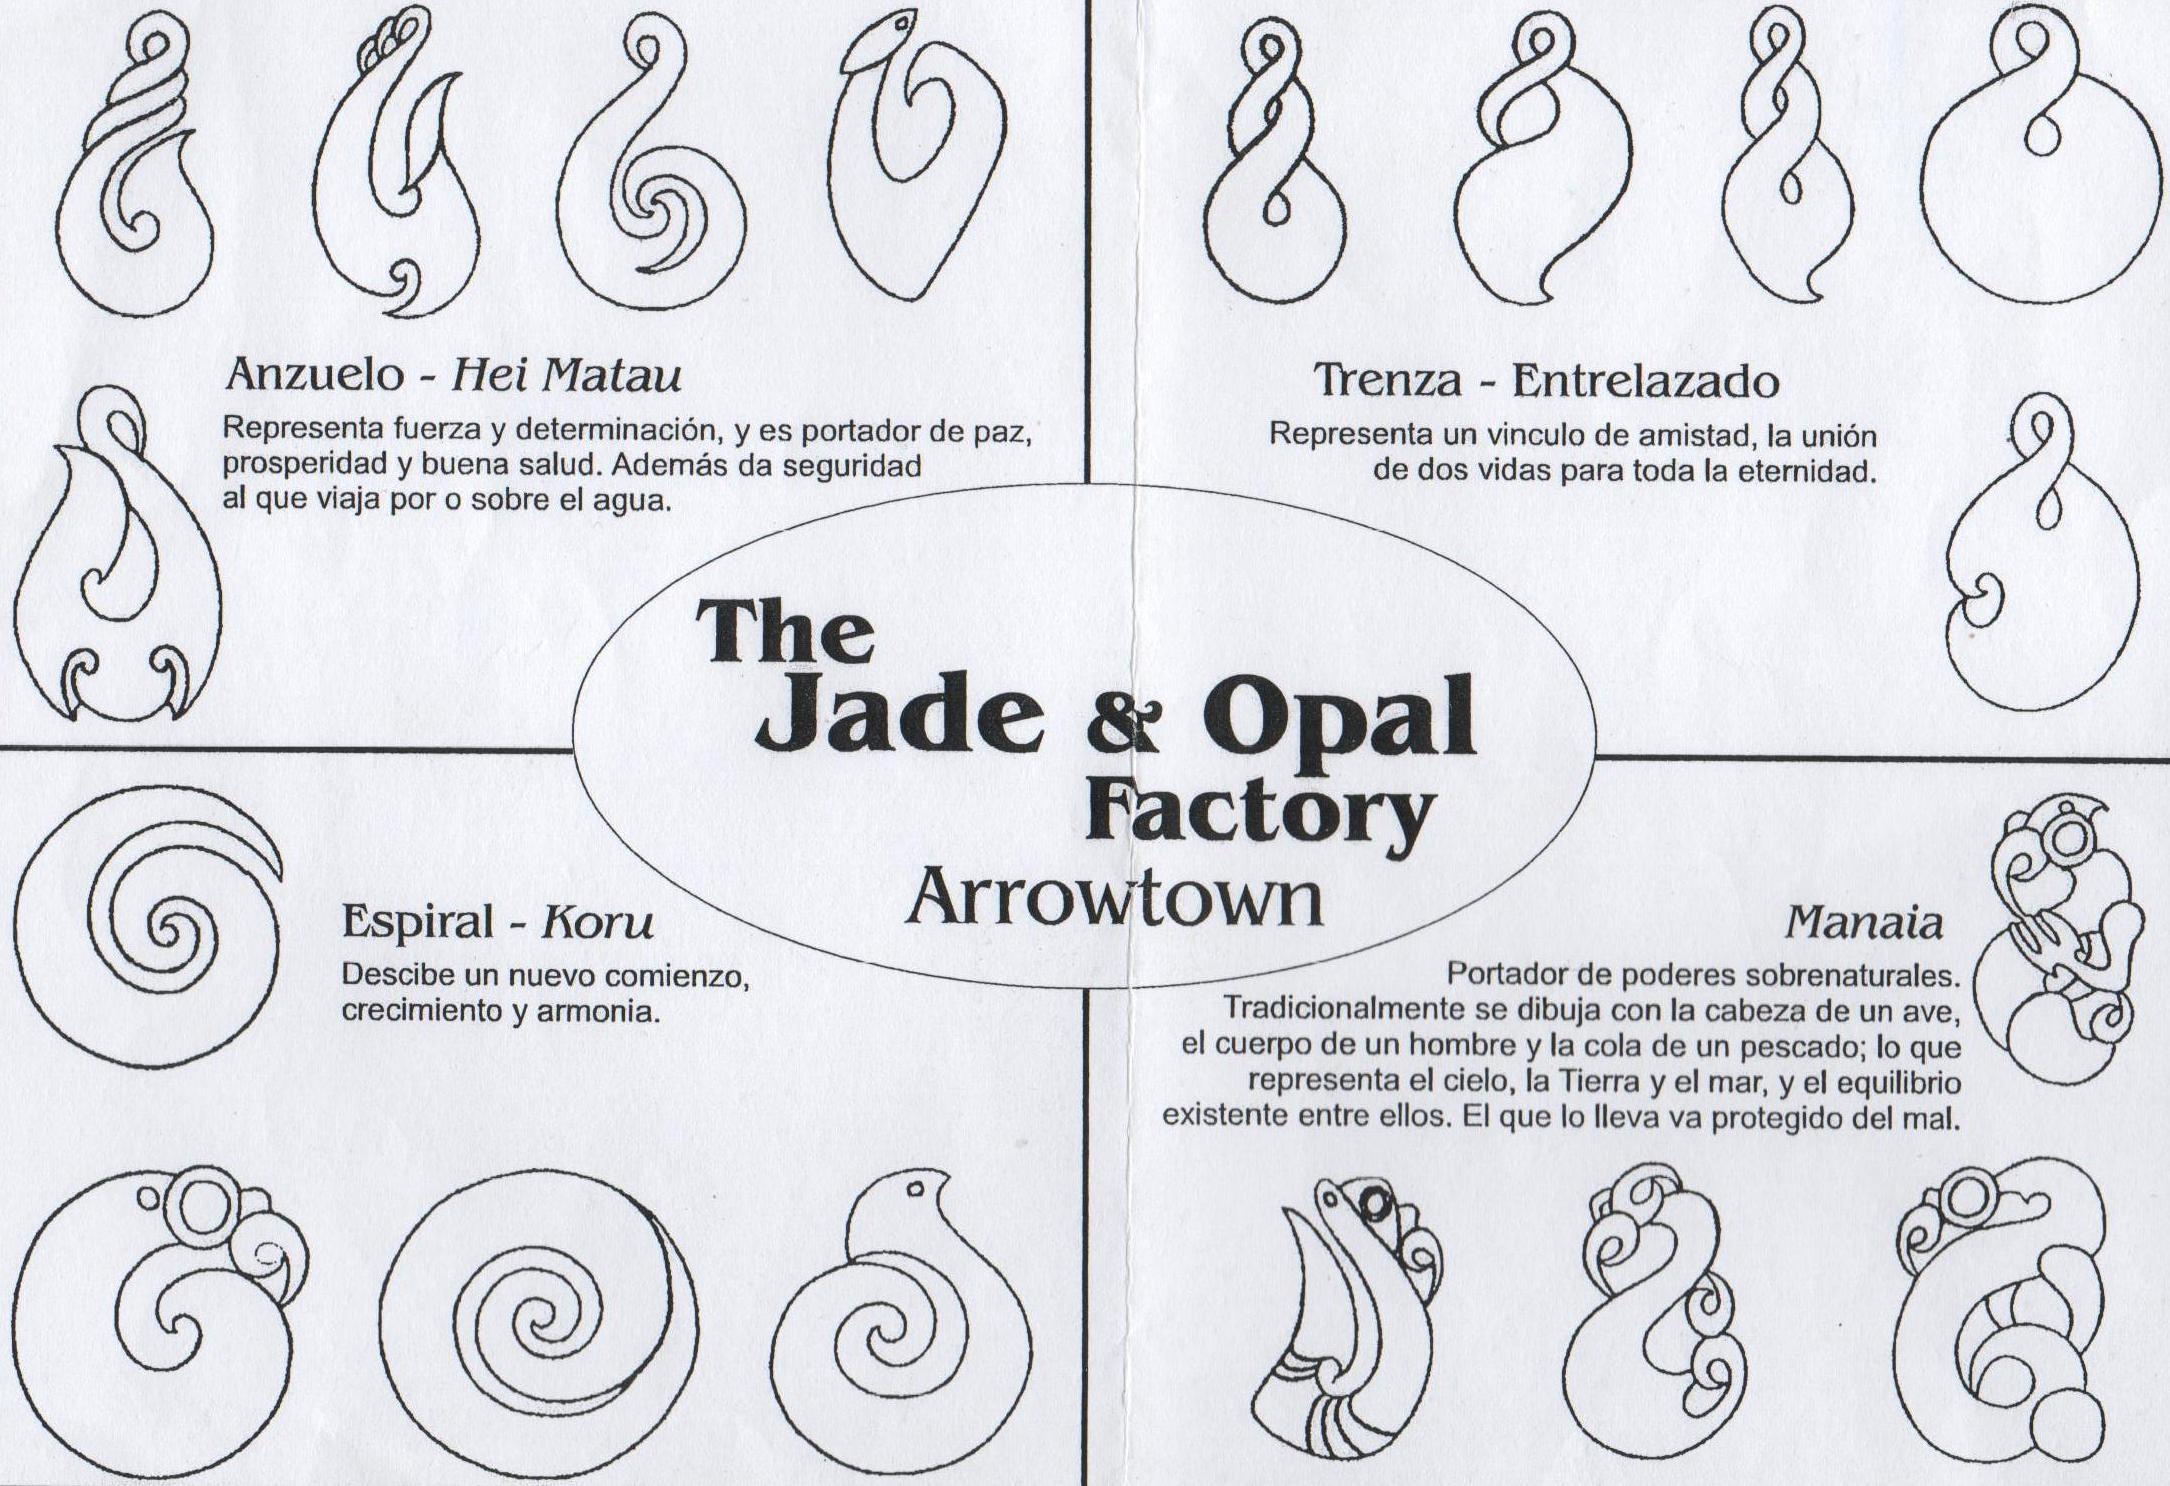 Significado Maories Interesting Simple Affordable Latest Free - Simbologia-maori-significado